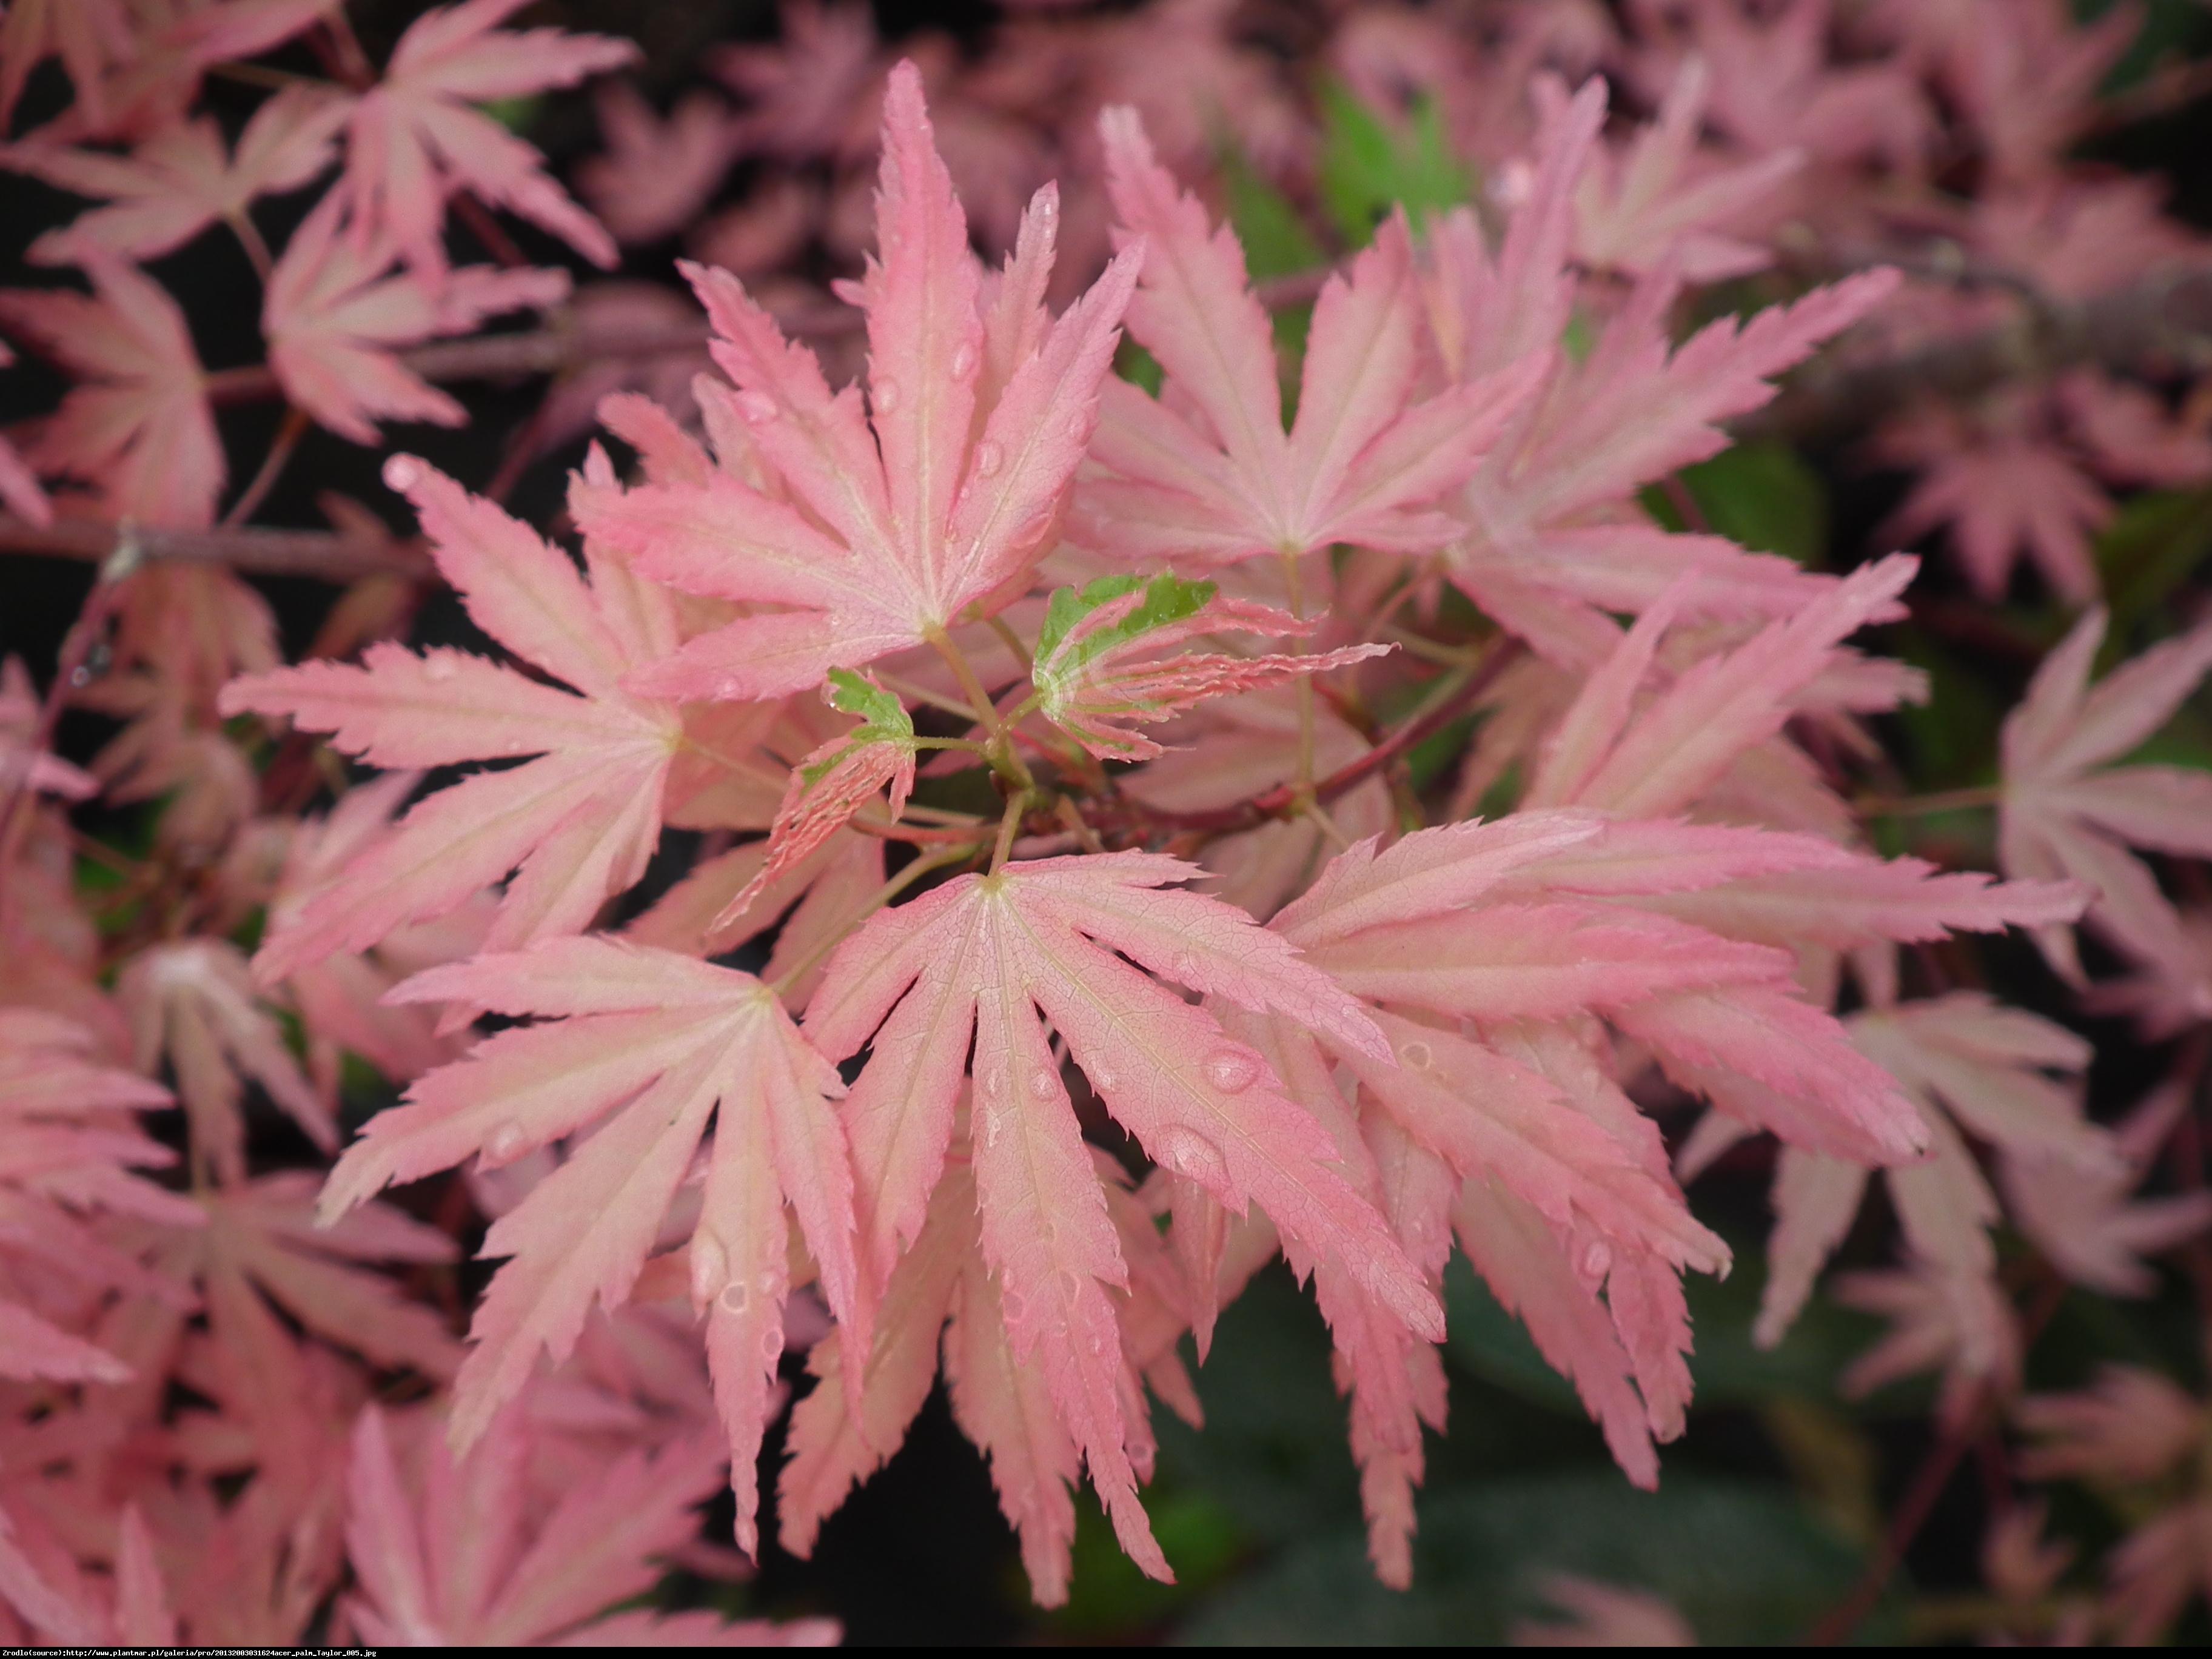 Klon palmowy Taylor - Acer palmatum Taylor